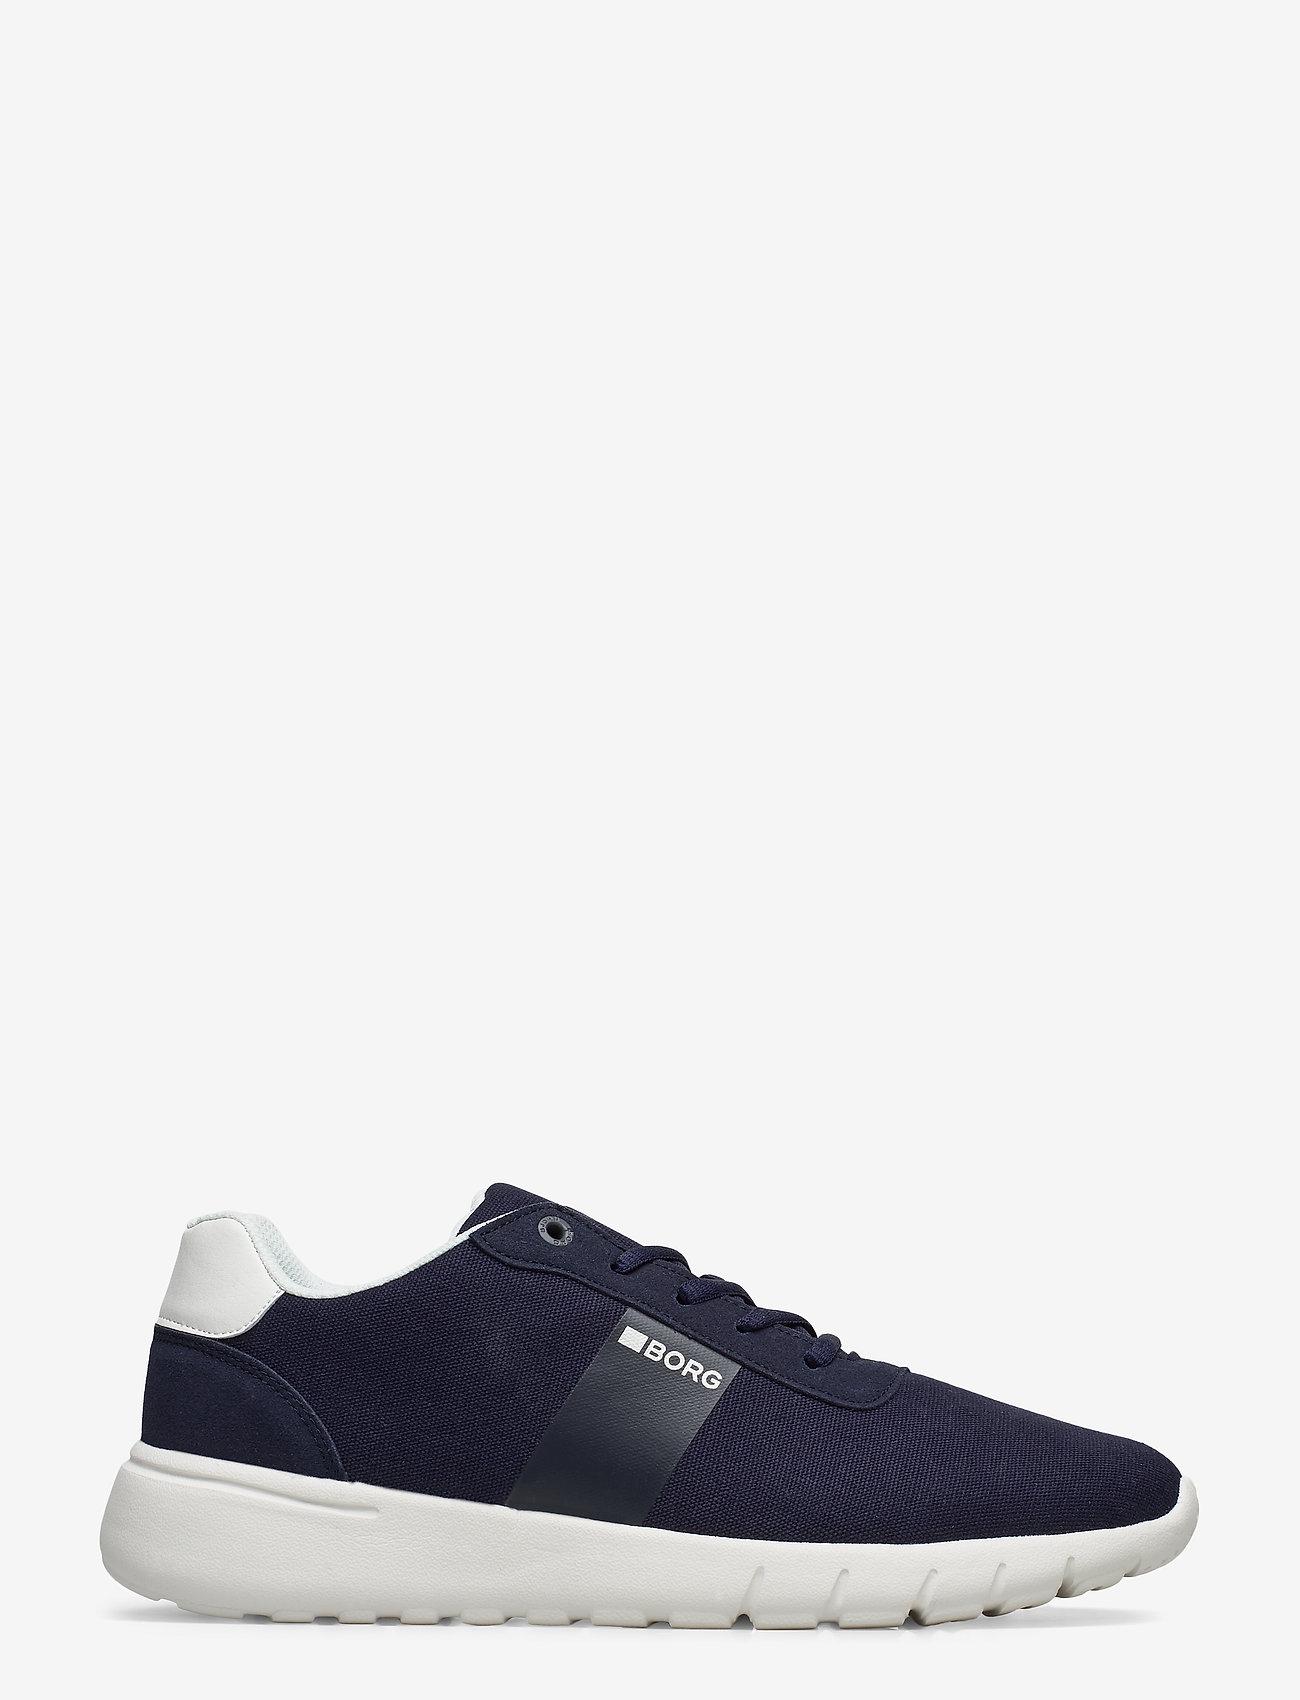 Björn Borg - R1060 CVS M - laag sneakers - navy - 1